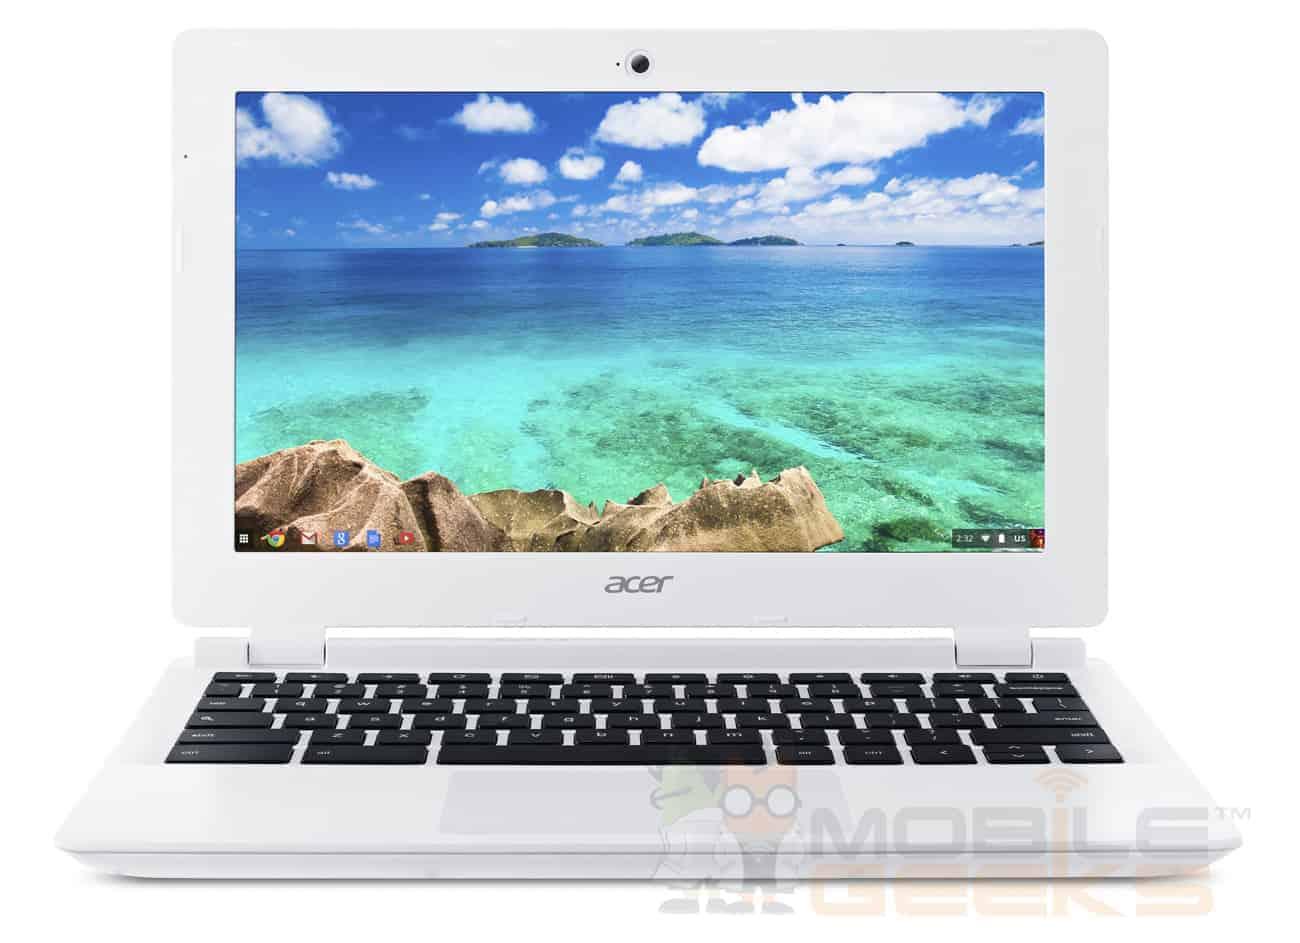 Acer-Chromebook-CB3-Acer-Chromebook-11-3